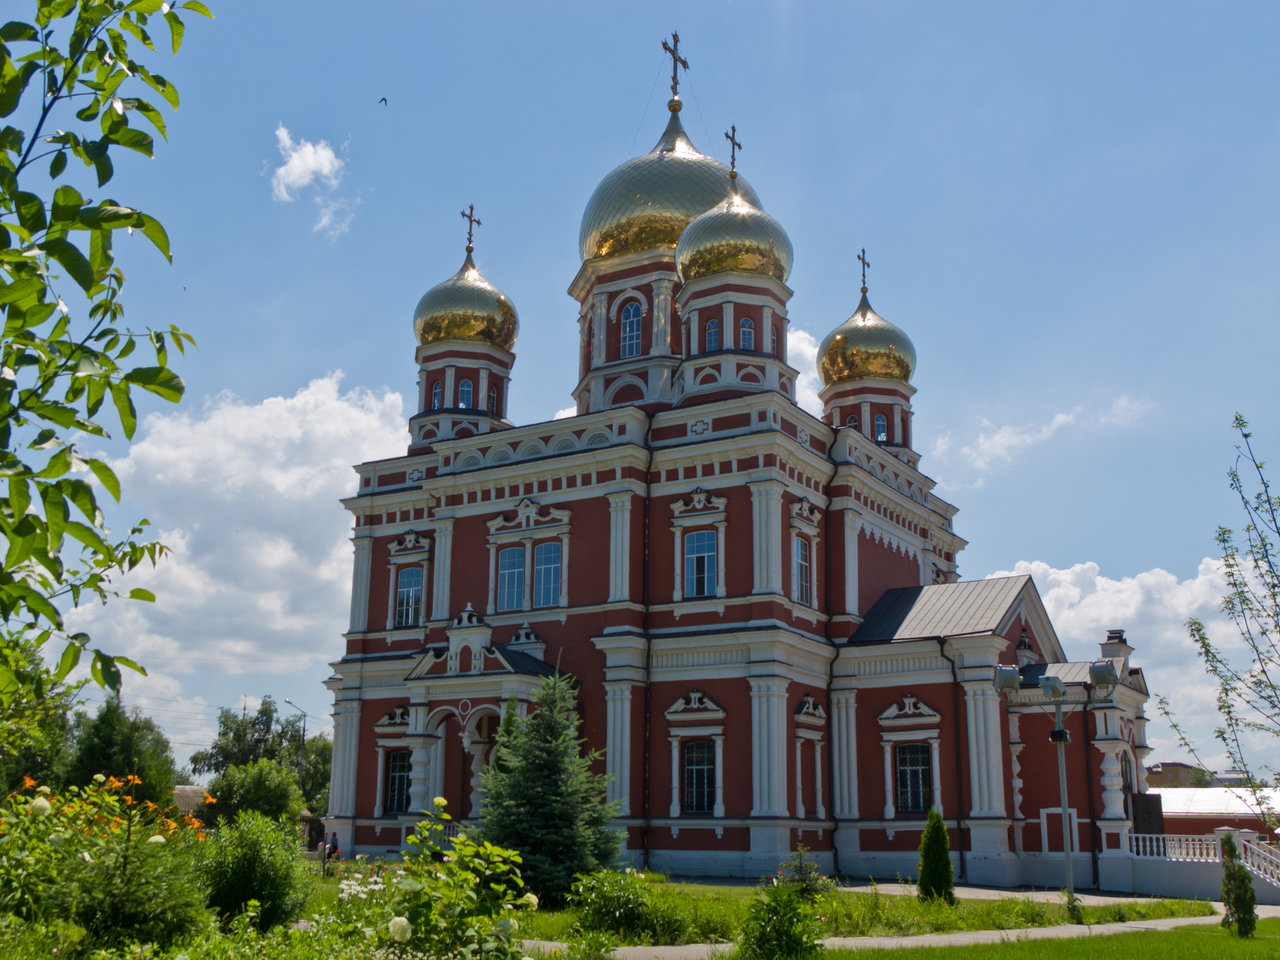 Церковь в саратове картинки